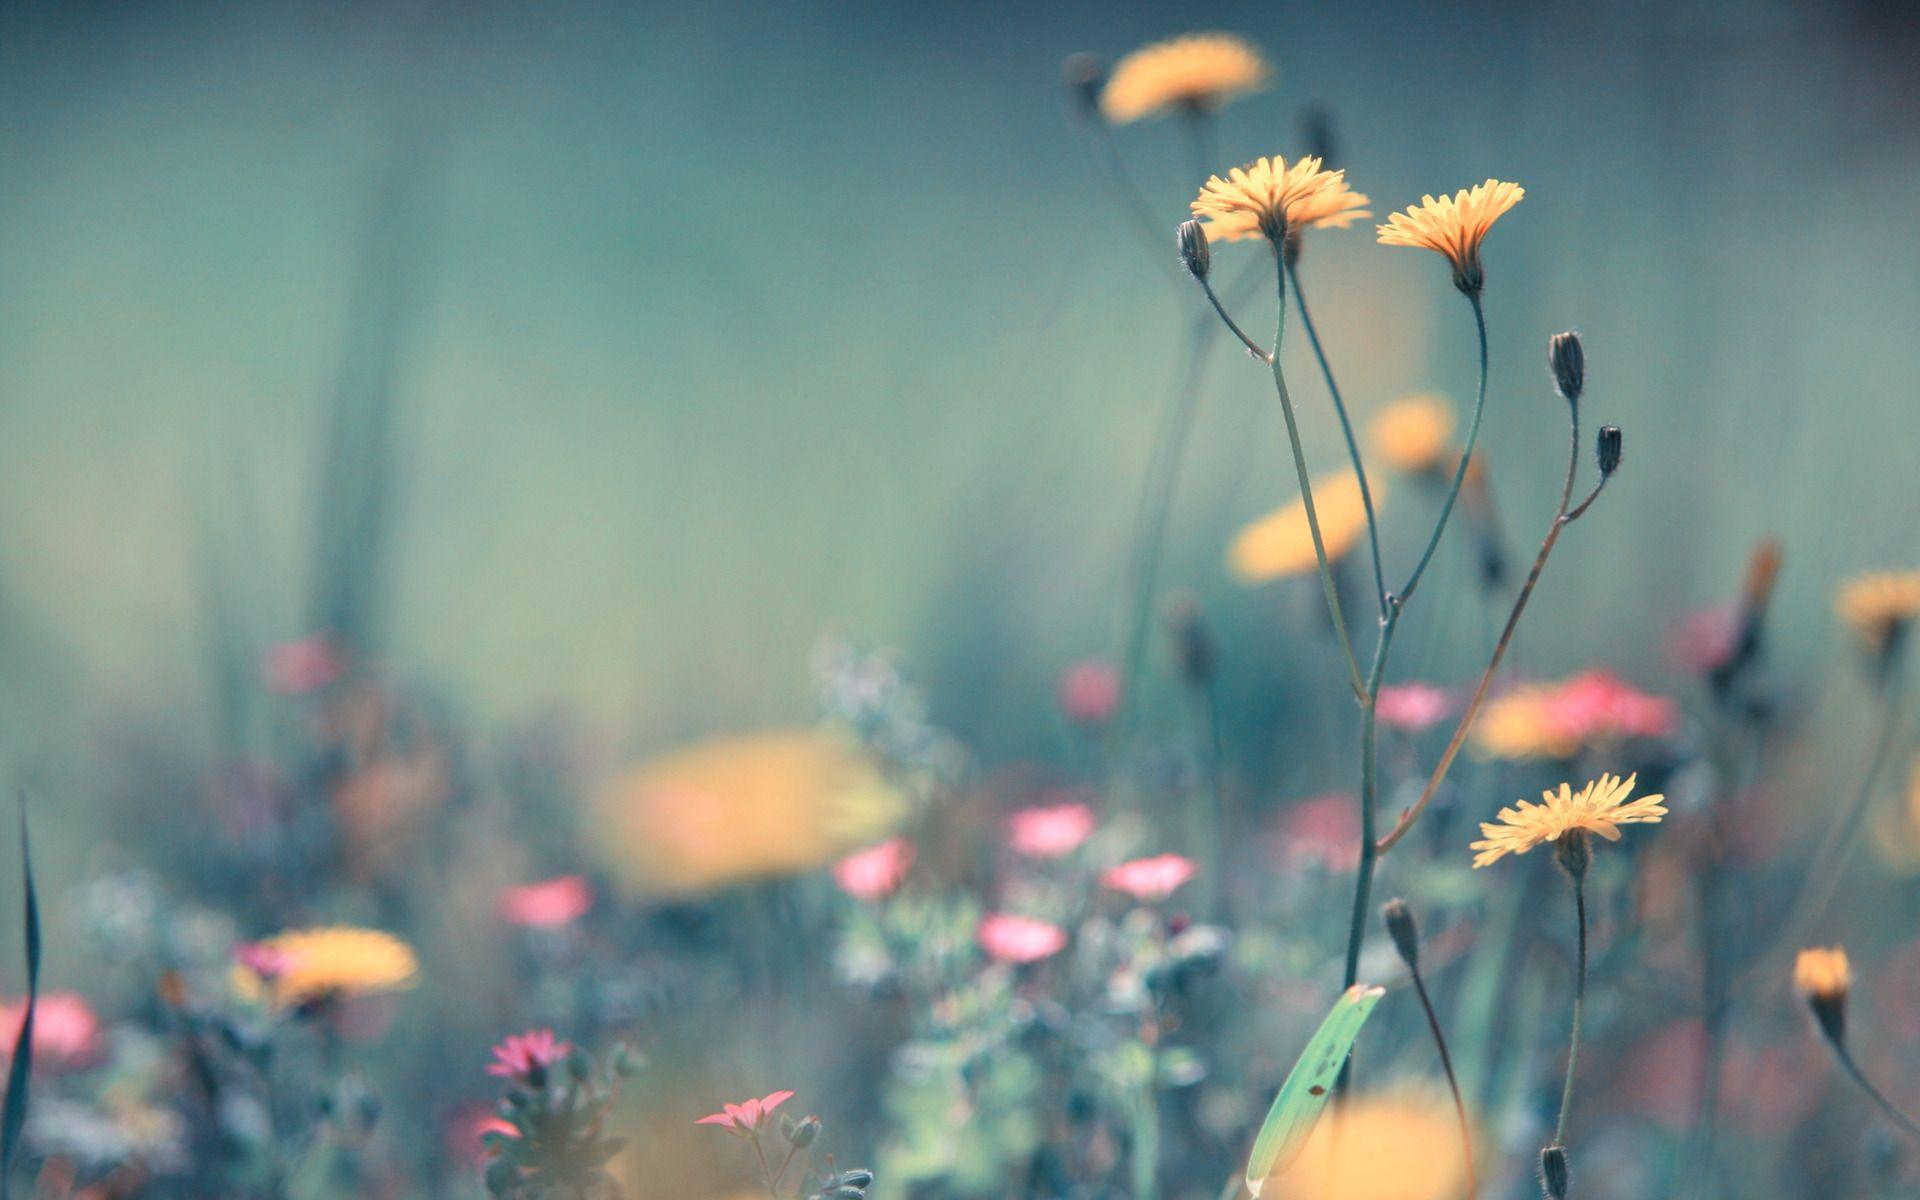 Wallpaper Of Summer Flowers